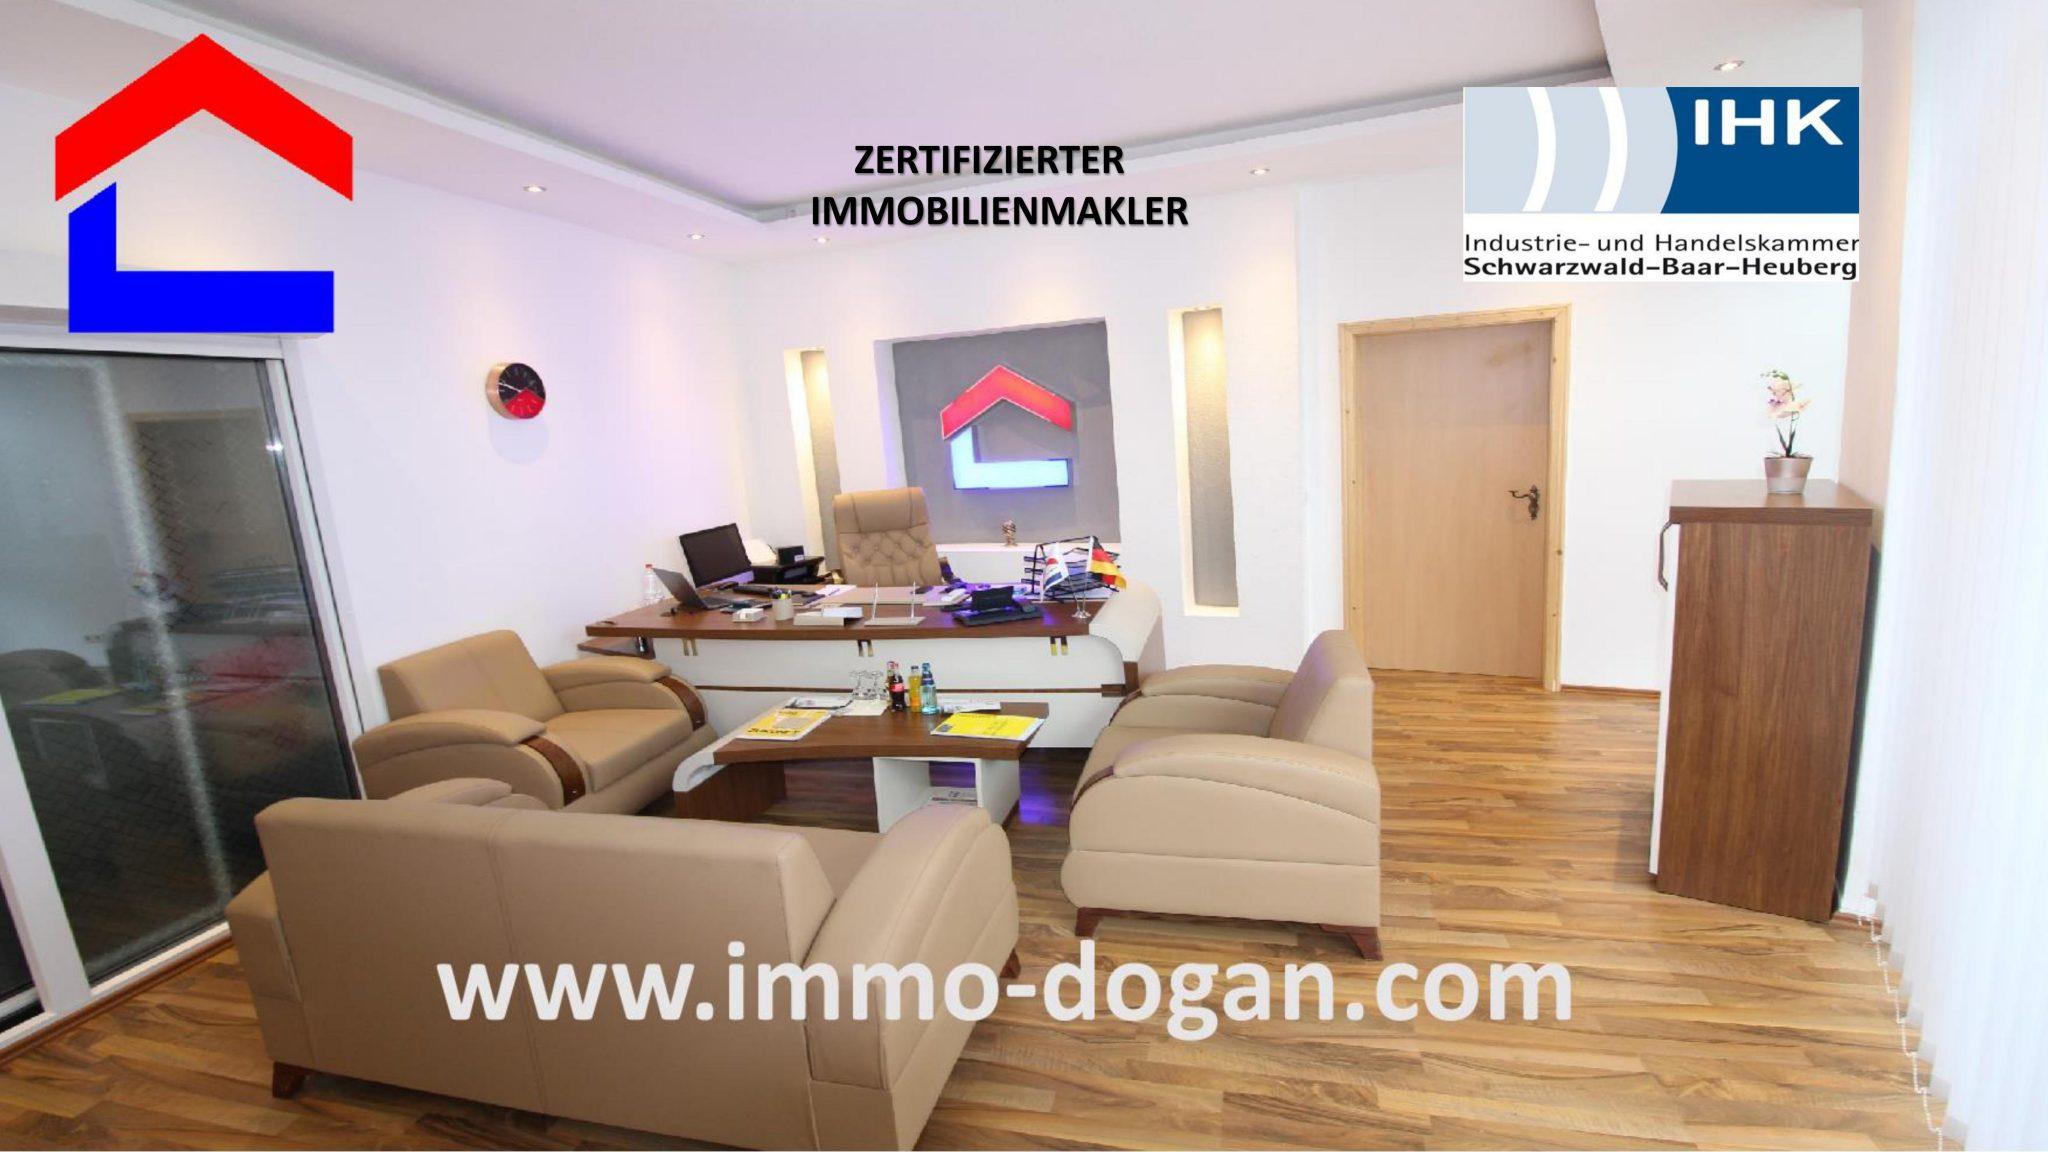 elegante und gro z gige 4 zimmer wohnung immendingen dogan immobilien immobilienmakler. Black Bedroom Furniture Sets. Home Design Ideas